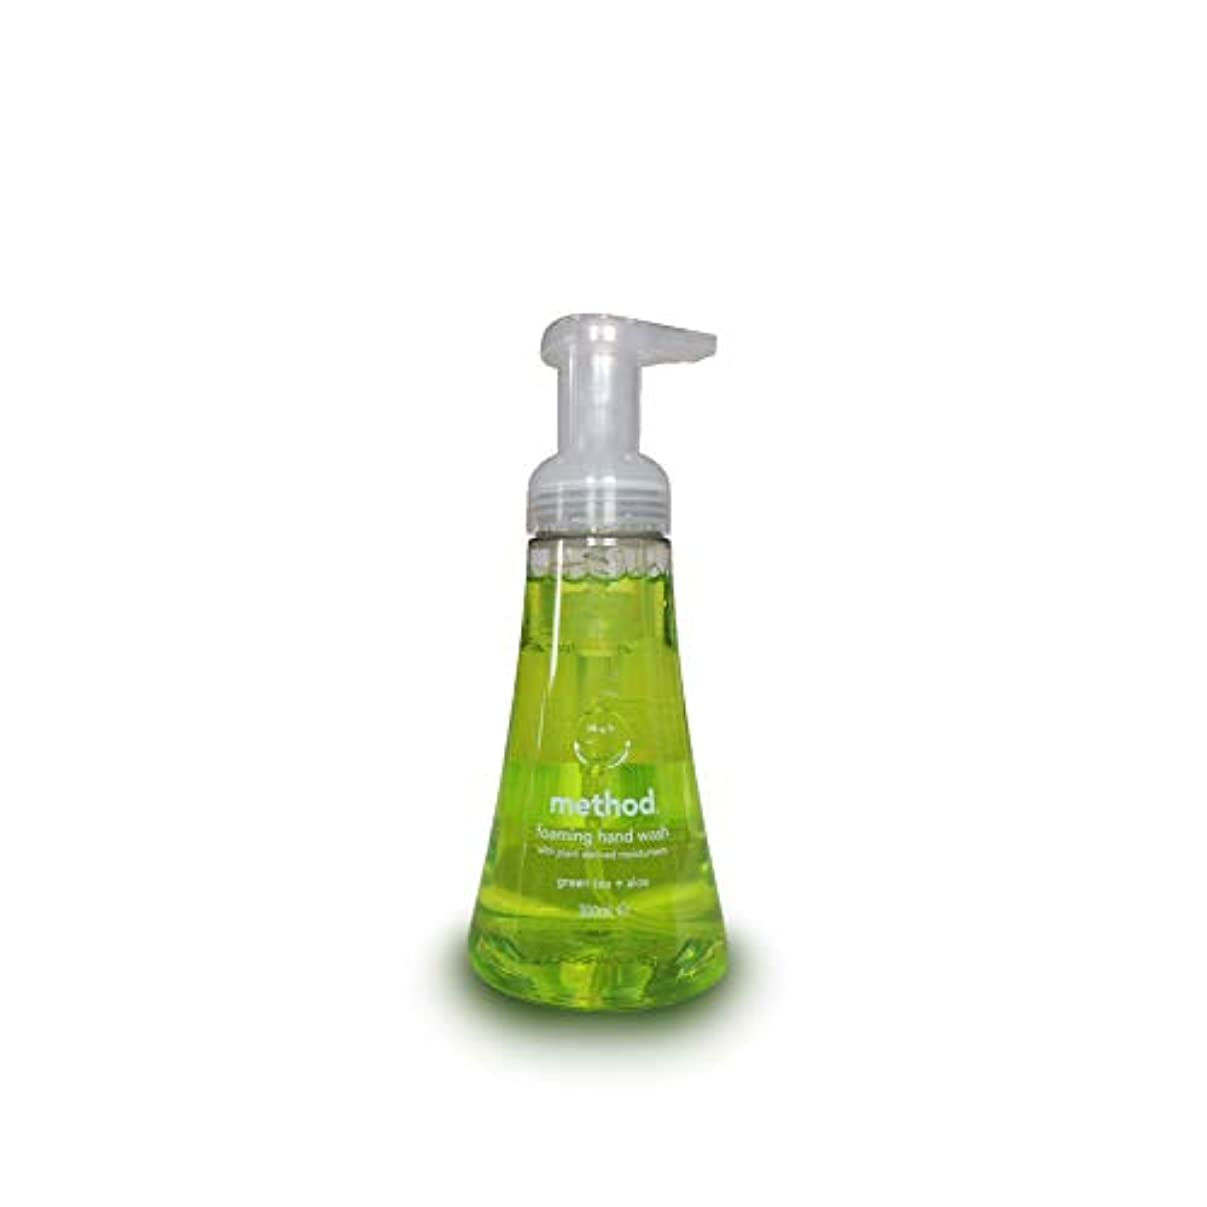 Method Foam Hand Wash Green Tea Aloe 300 ml (Pack of 3)